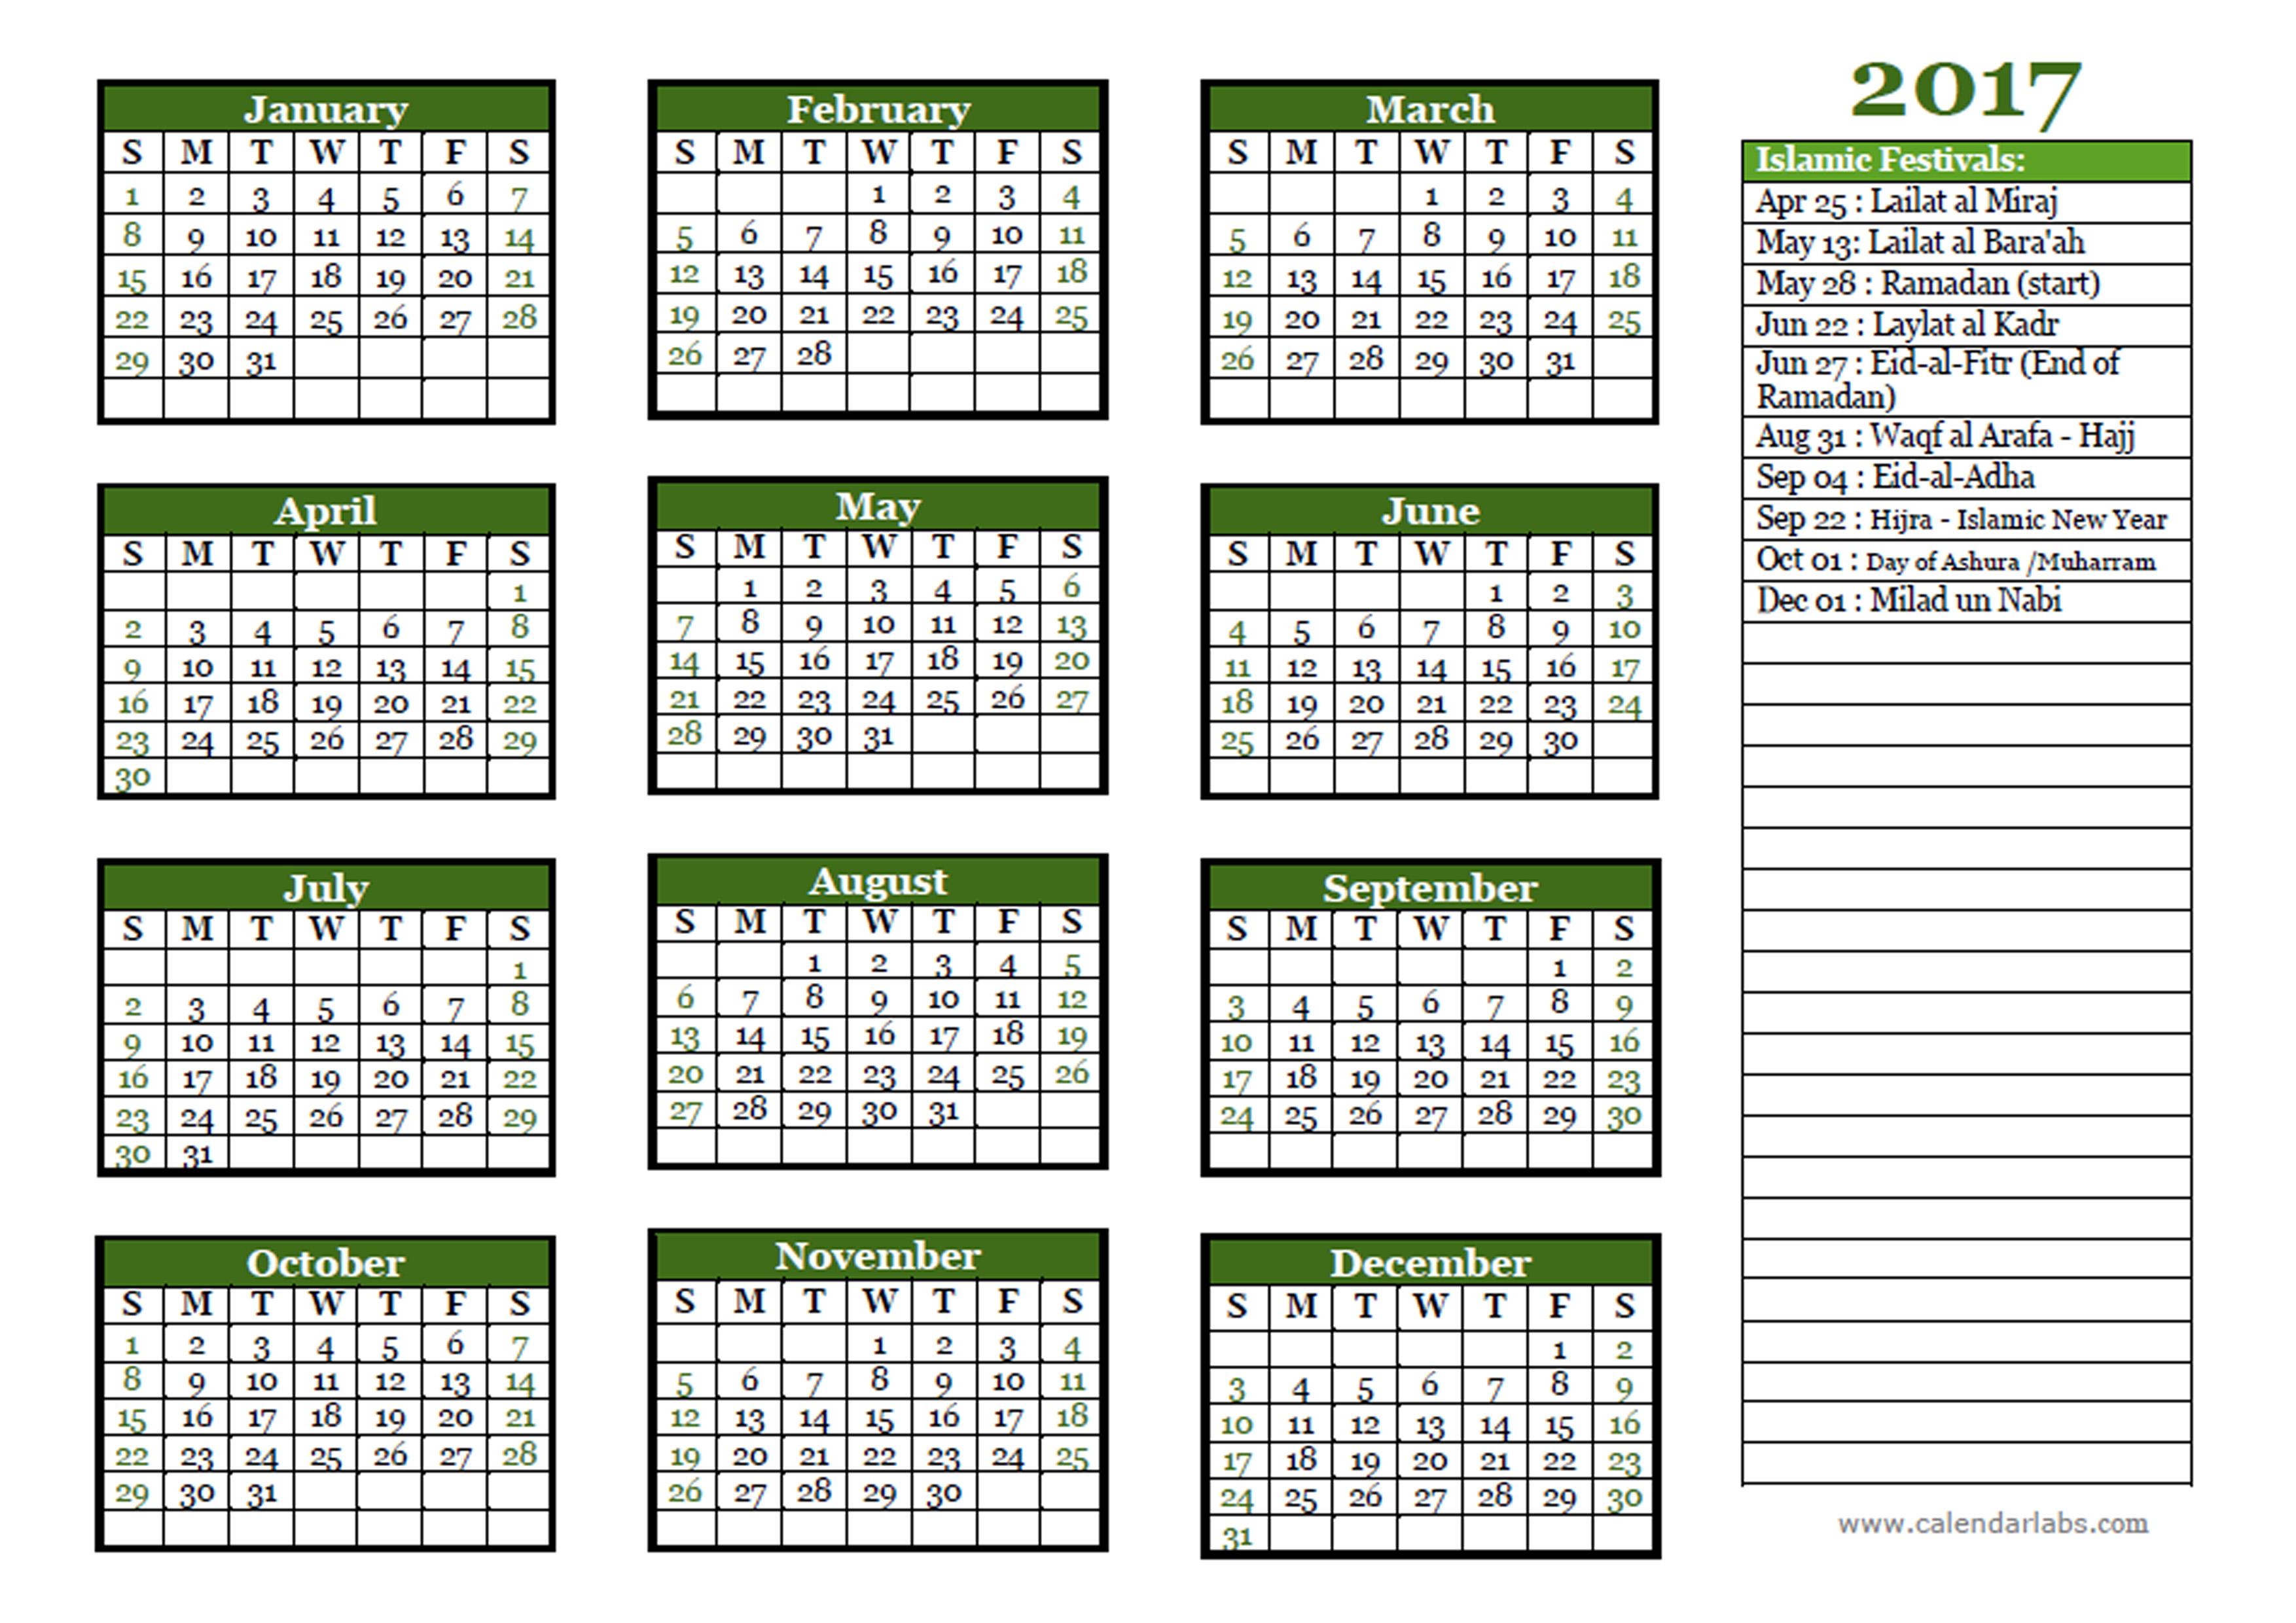 2017 Islamic Festivals Calendar Template - Free Printable ...